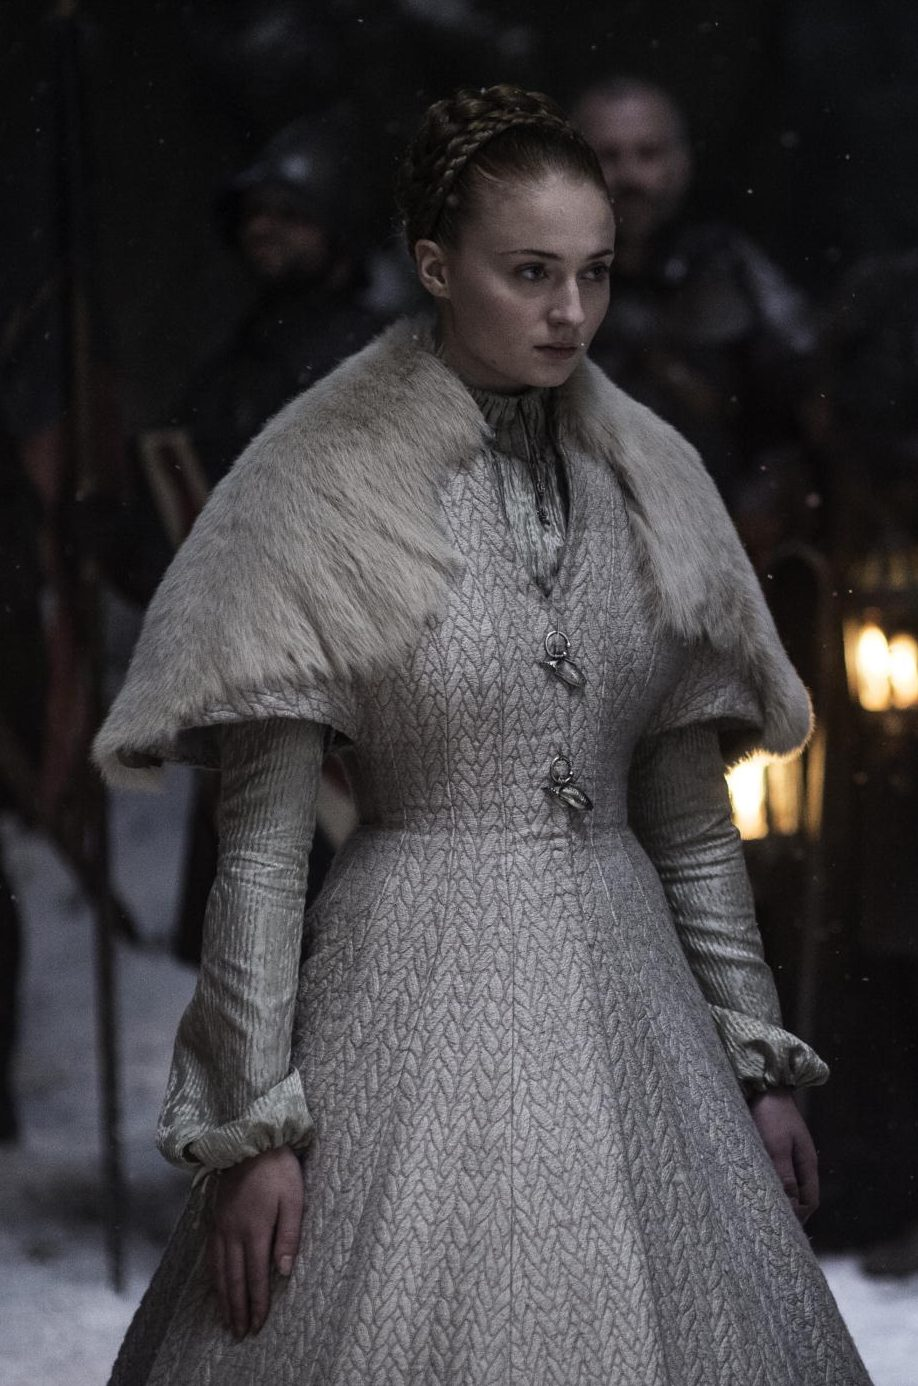 The Wardrobe Metamorphosis Of Sansa Stark Backroom Whispering